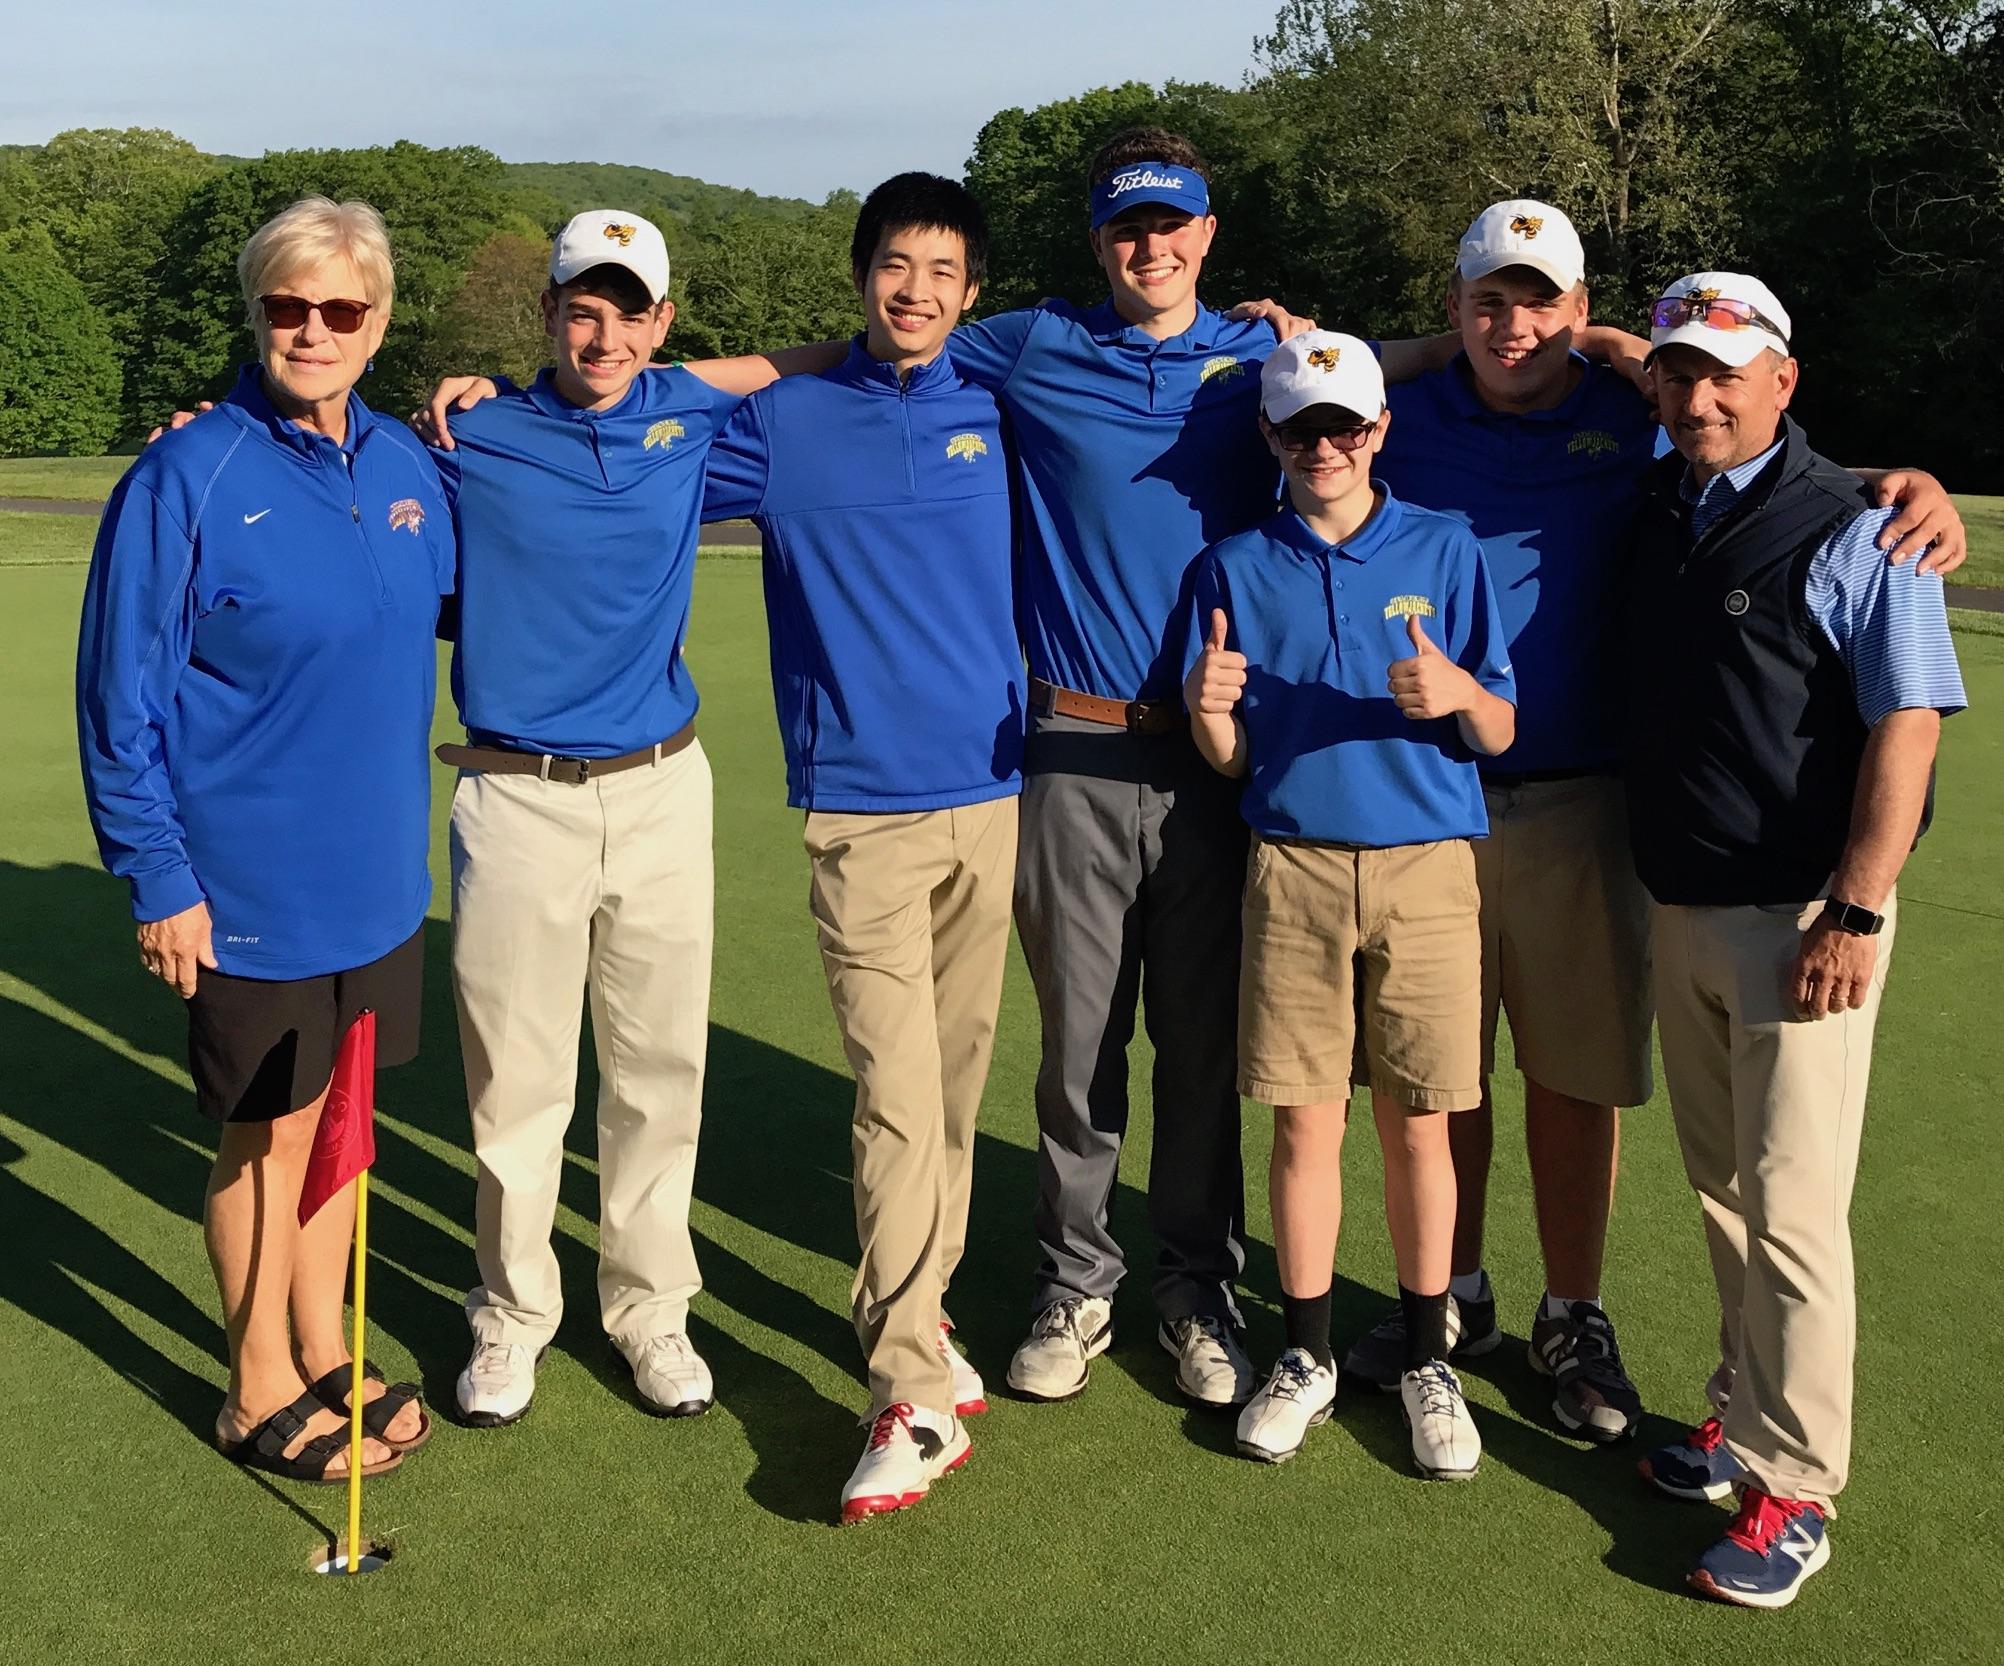 2017 Berkshire League Golf Champions